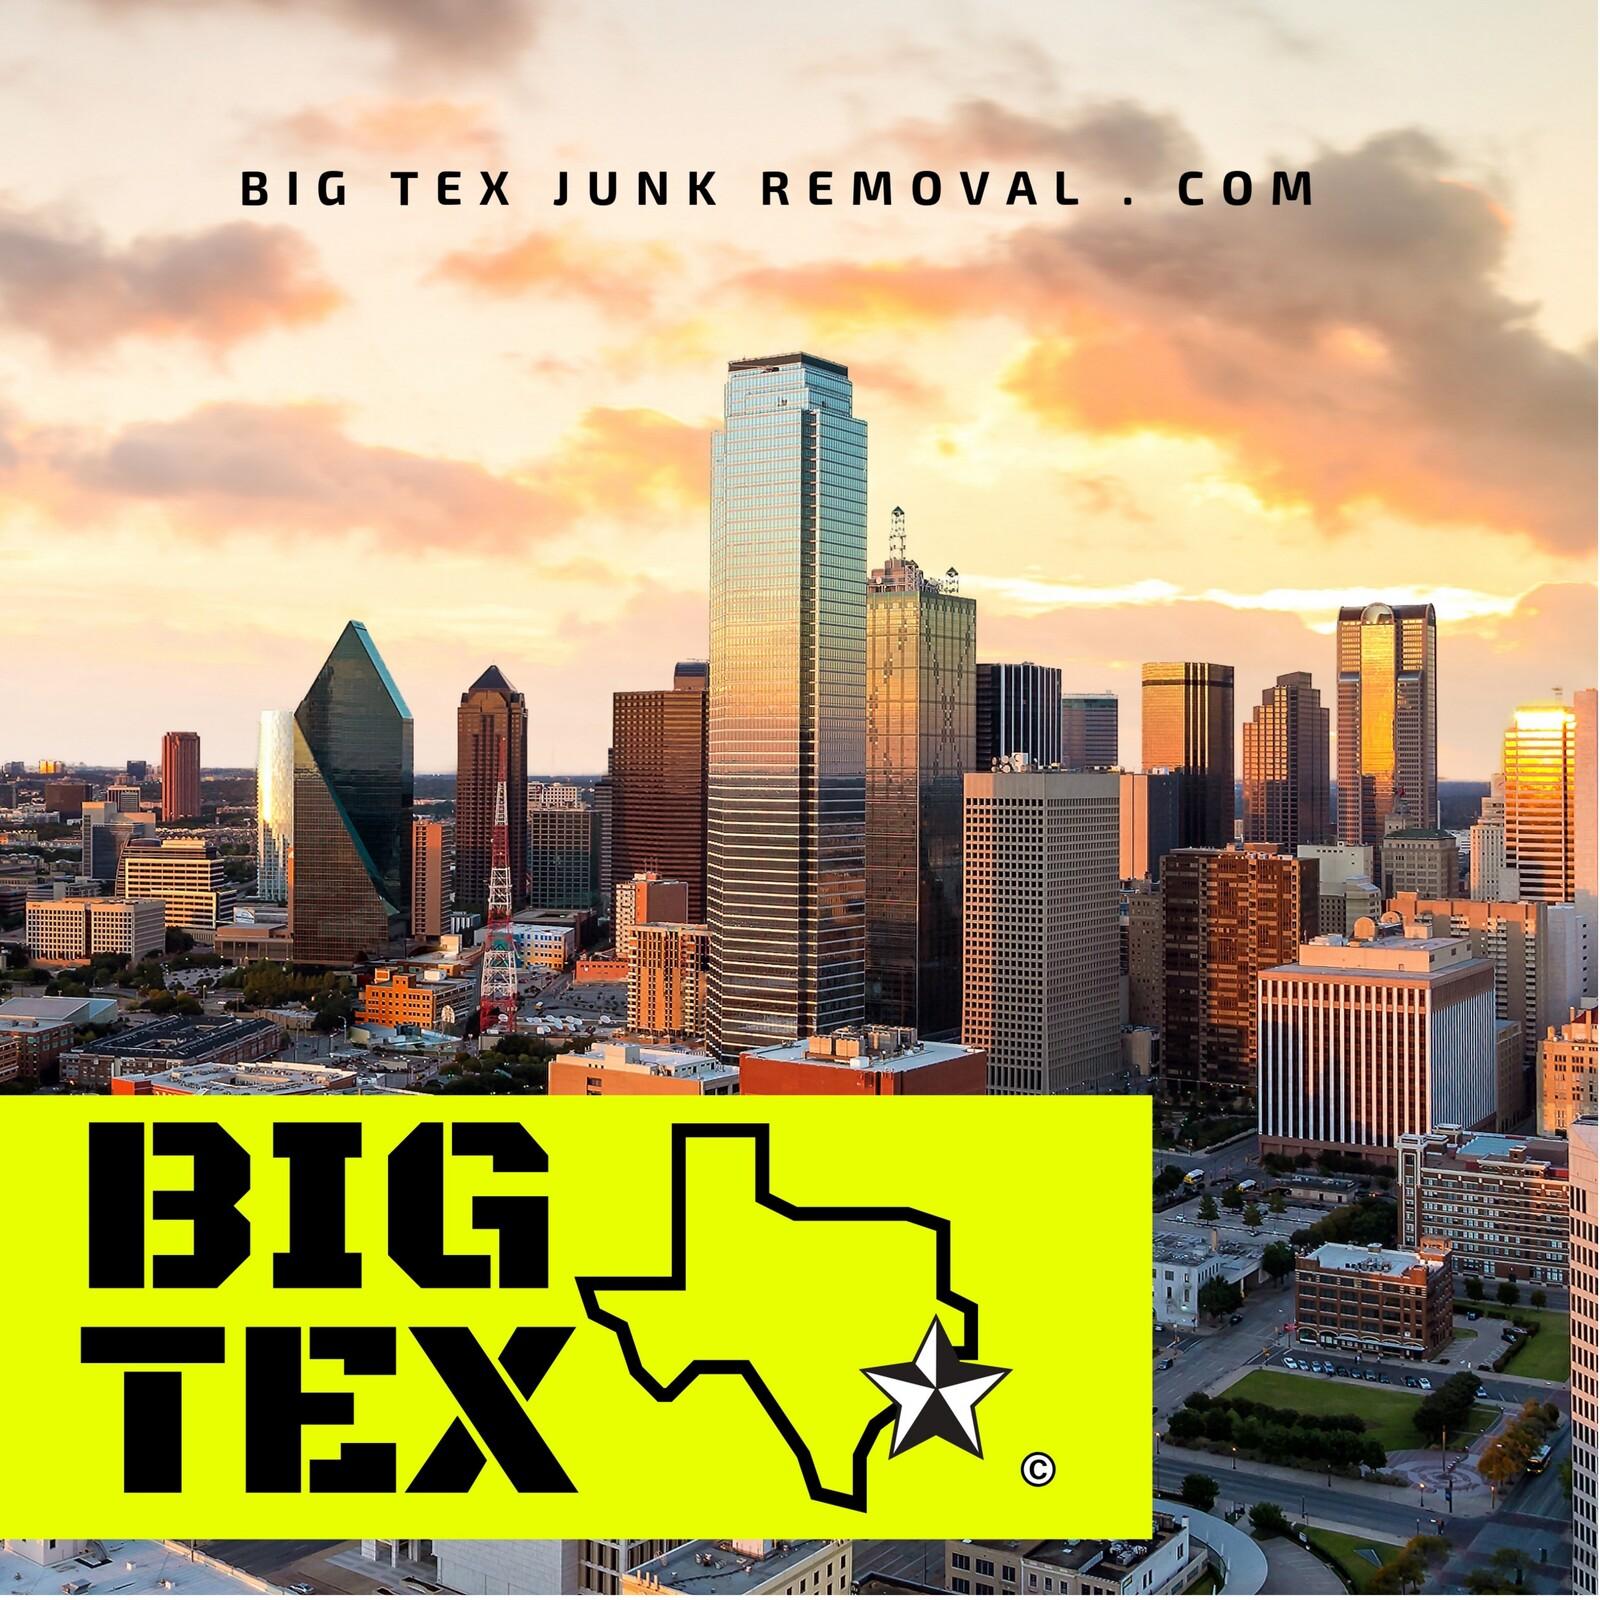 BIG TEX Junk Removal, located in Dallas, TX. Based in Arlington, TX. https://www.bigtexjunkremoval.com/